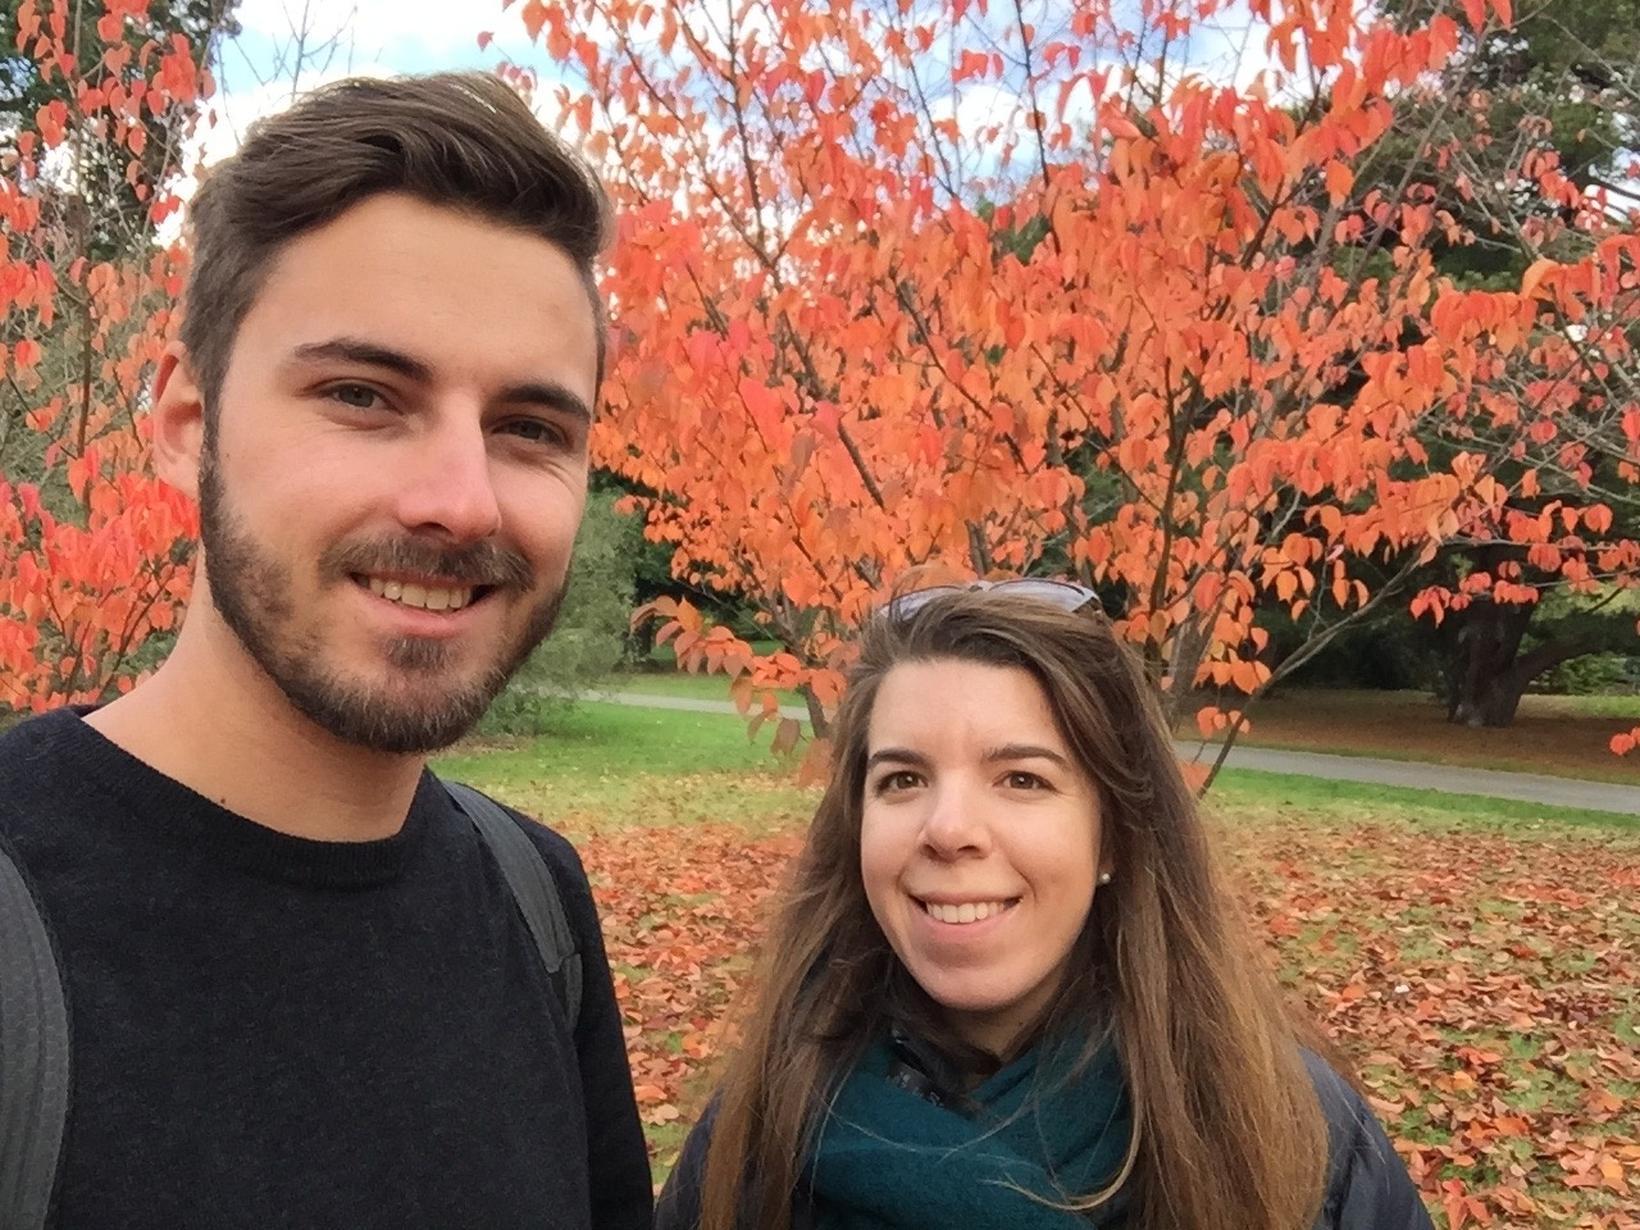 Bridget & Samuel from London, United Kingdom